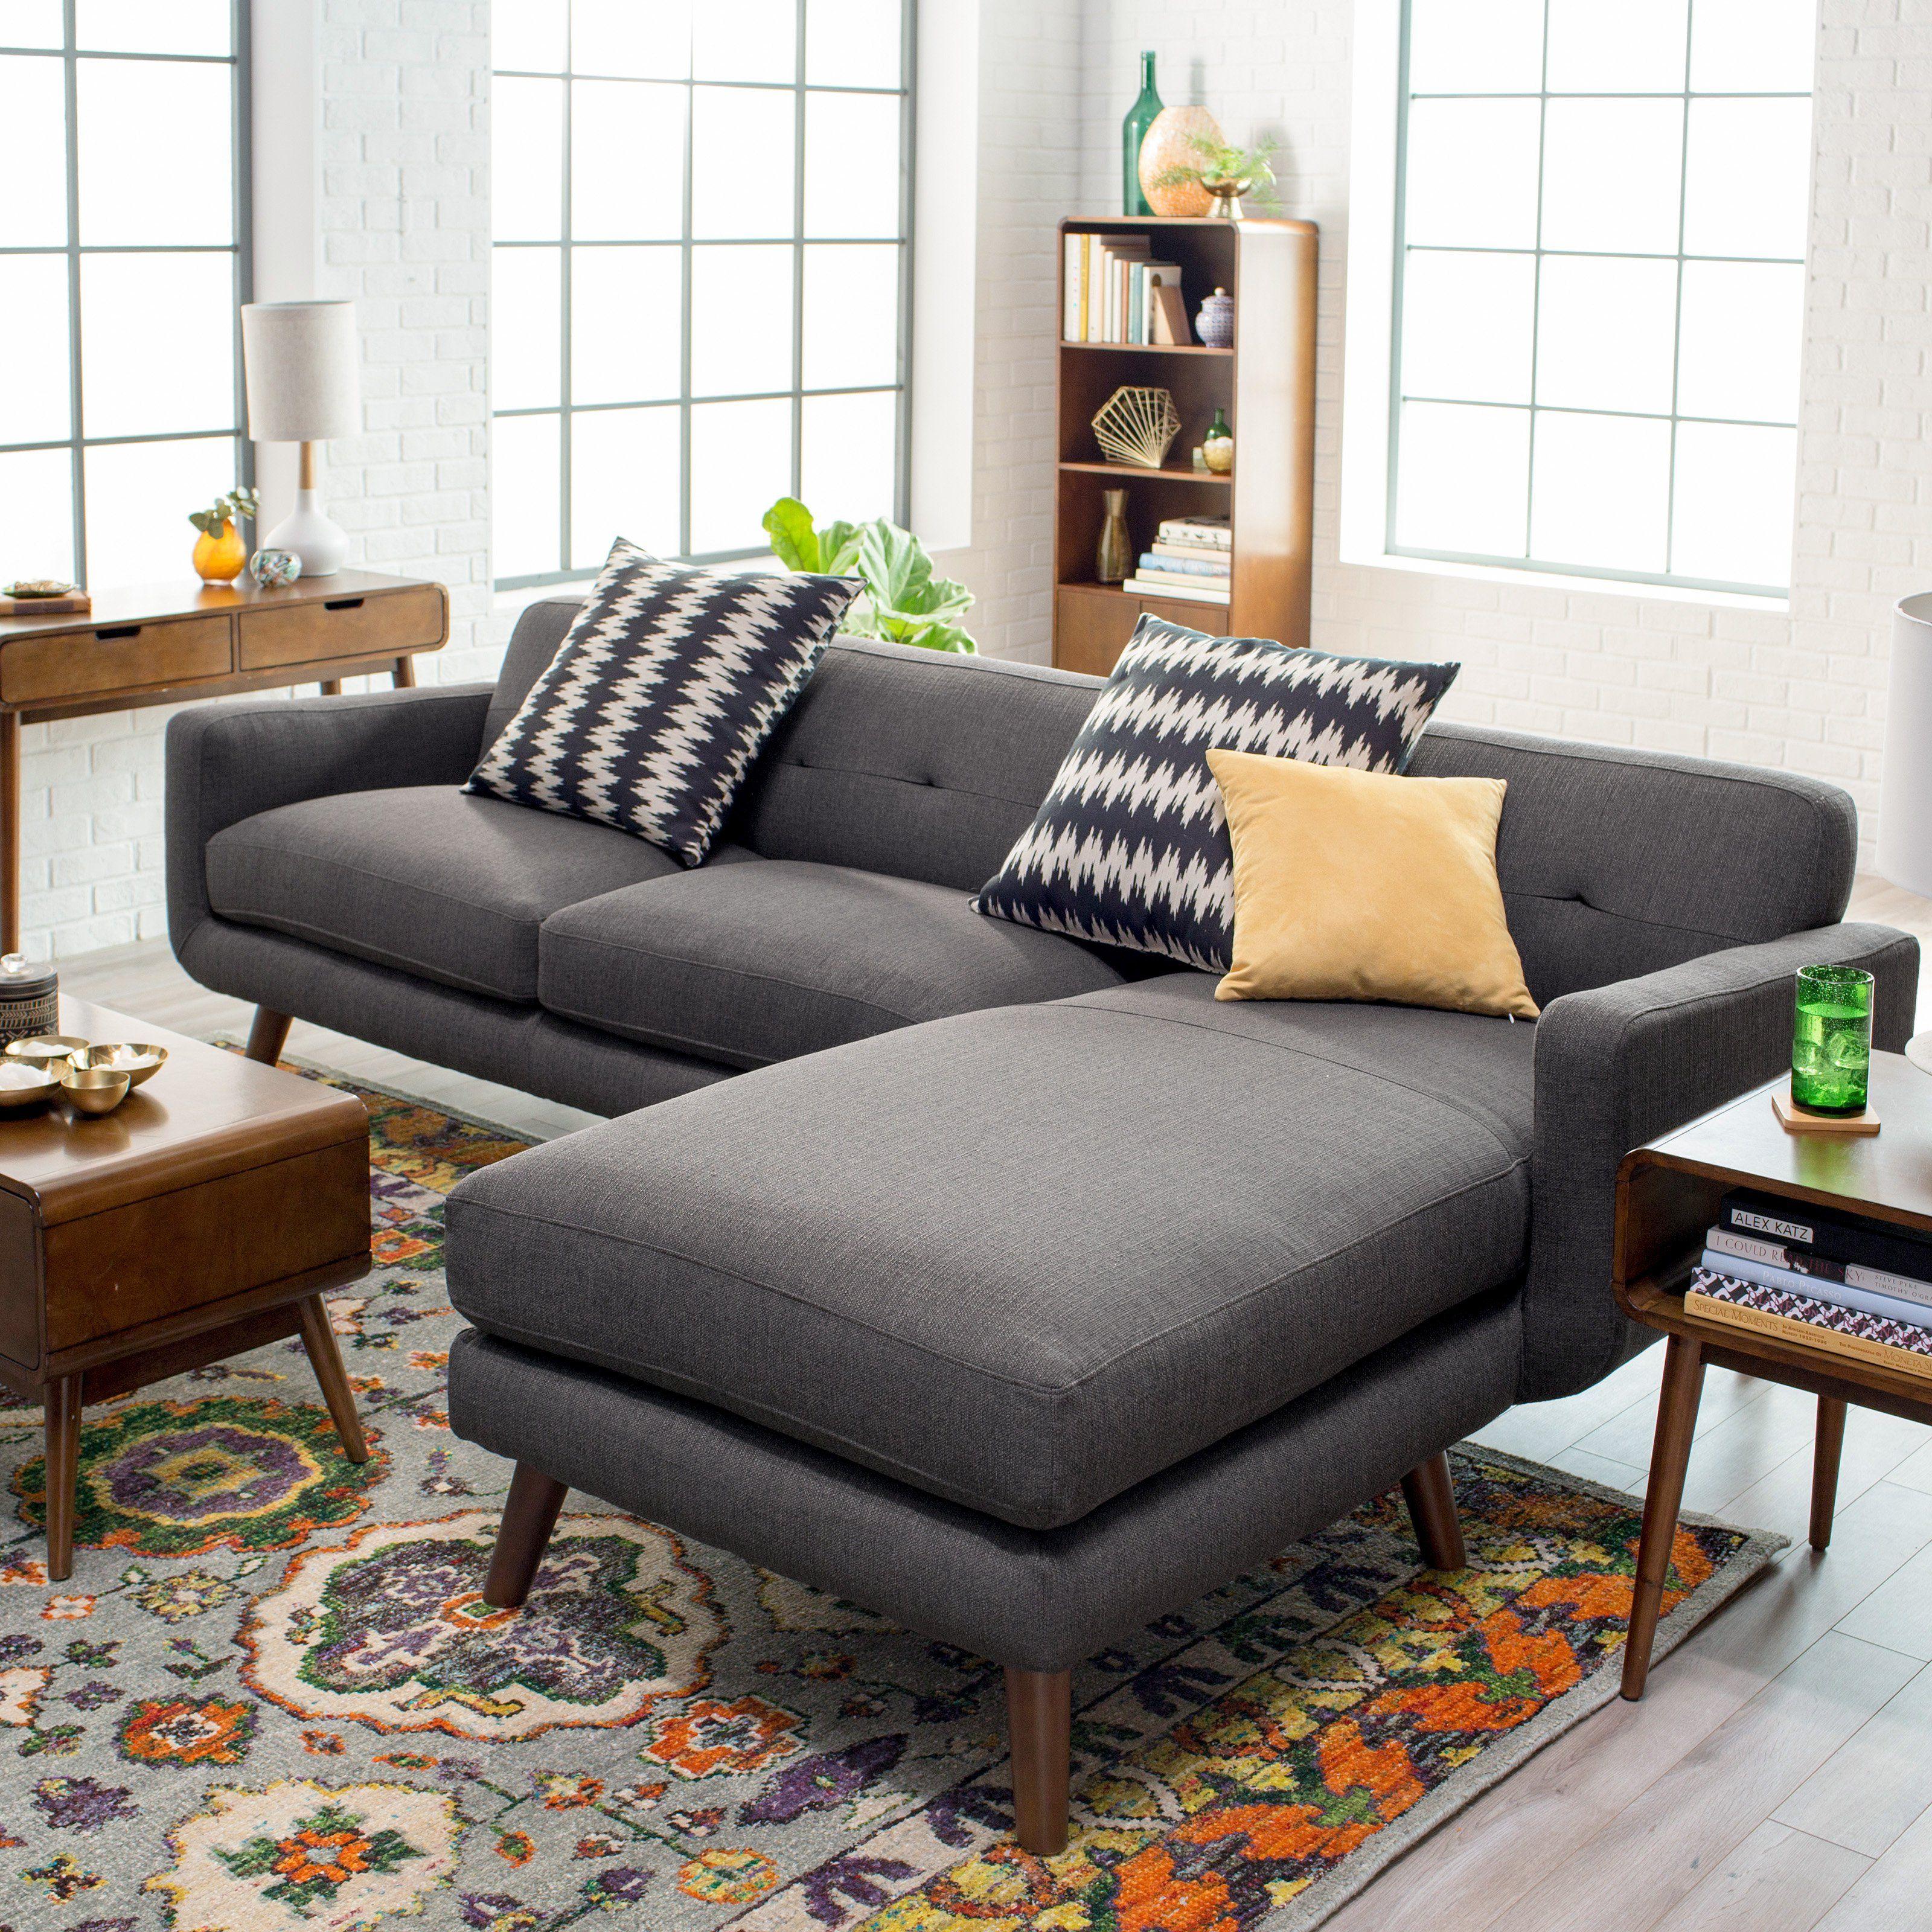 Belham Living Carter 2 Piece Sectional with 2 Accent Pillows